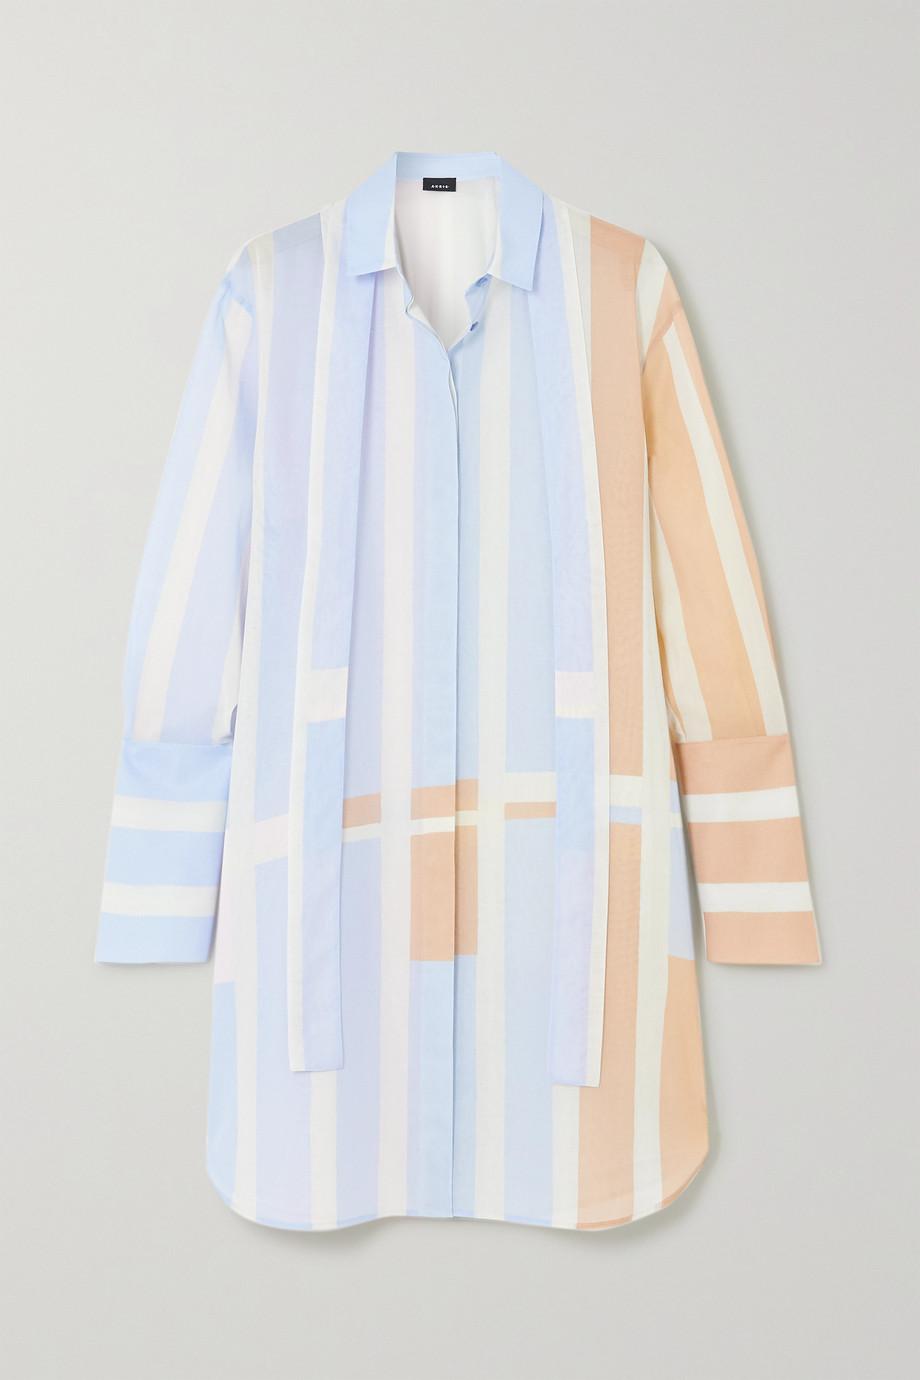 Akris Pussy-bow striped woven mini shirt dress